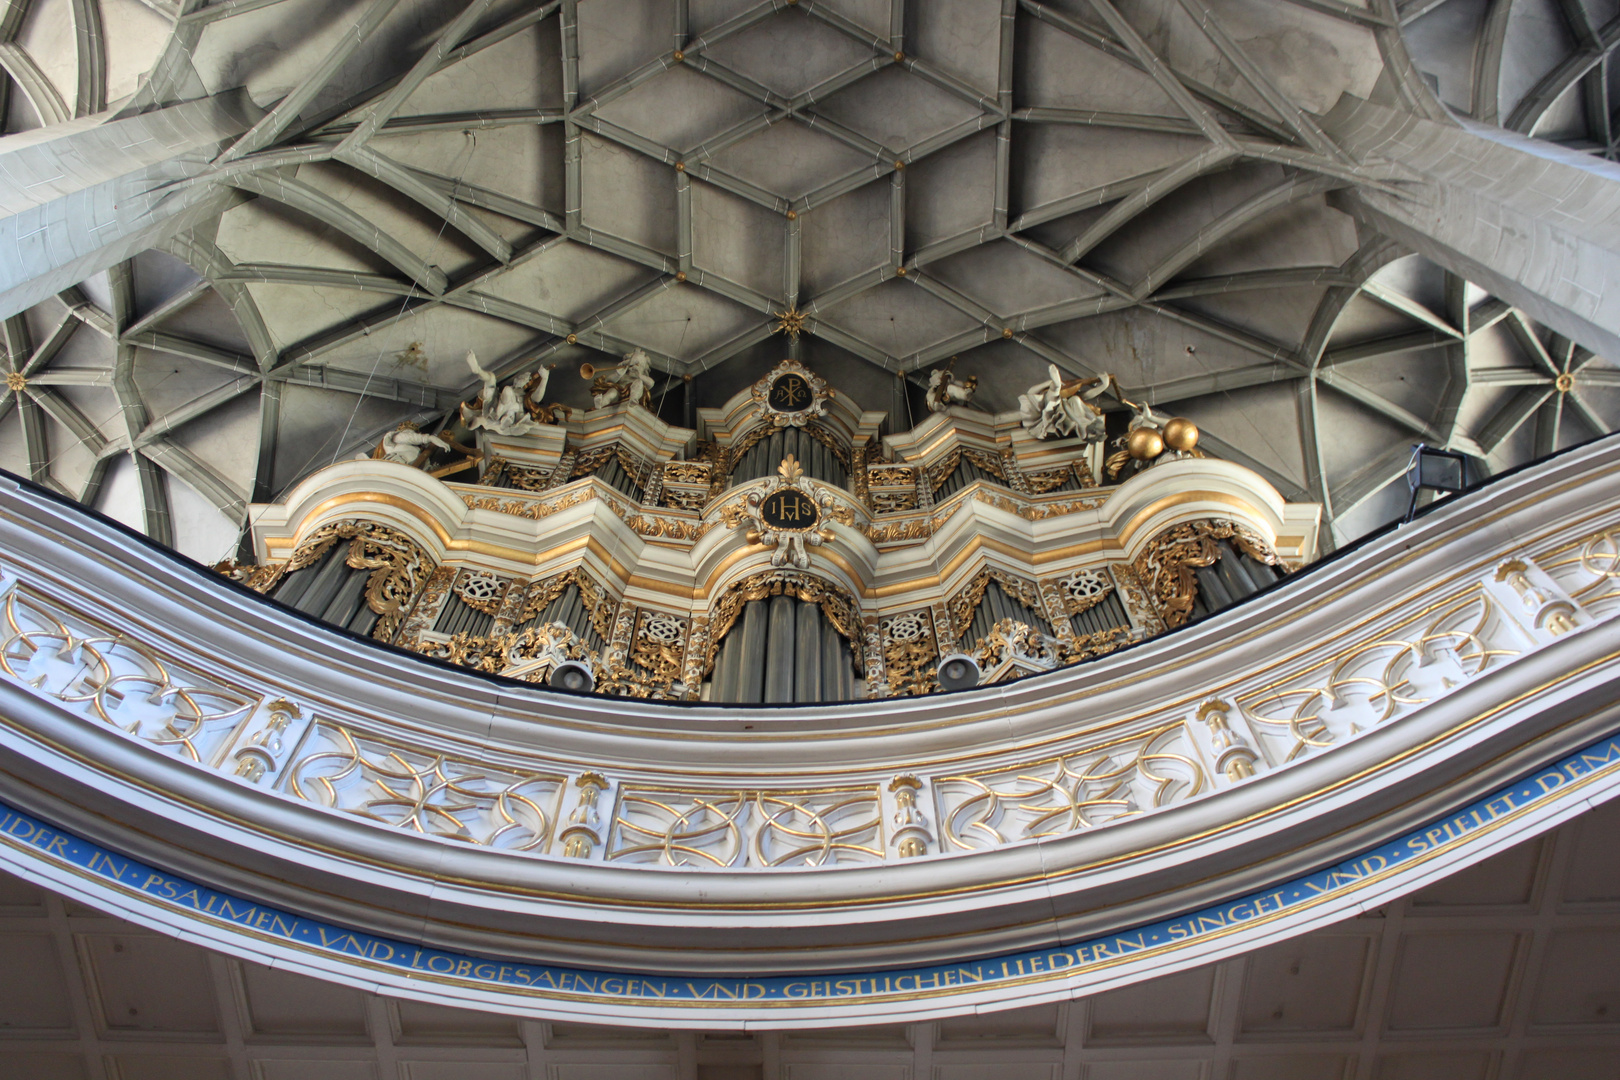 Orgel bei uns in Halle/Saale